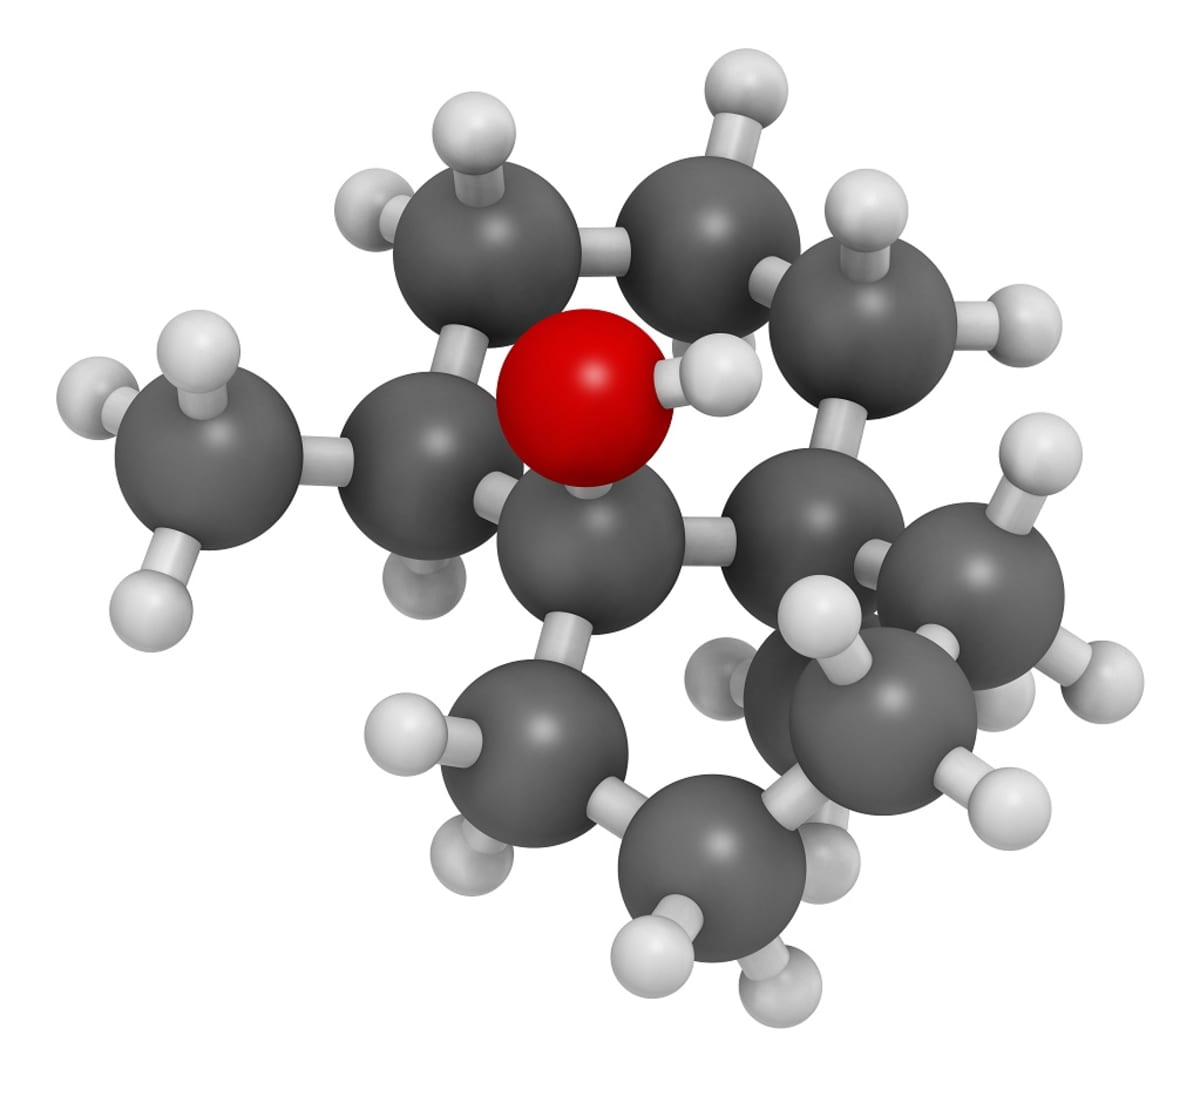 Molekyylimalli geosmiinista.